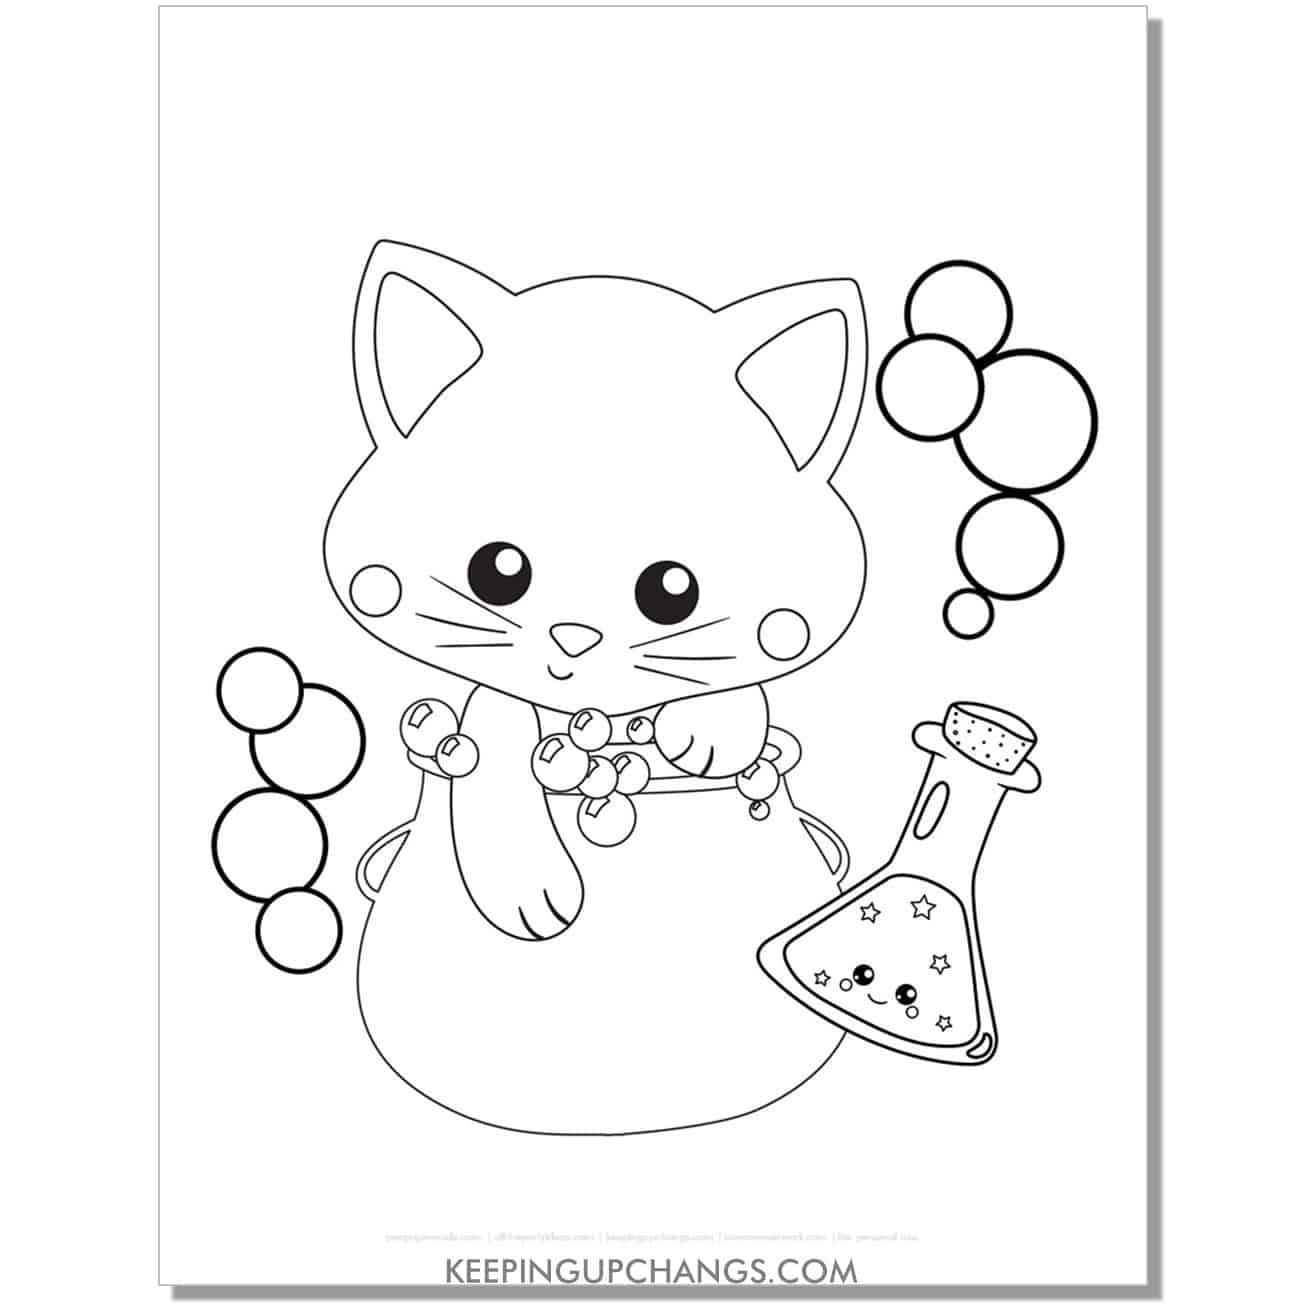 kawaii halloween cat with cauldron, potion coloring page.